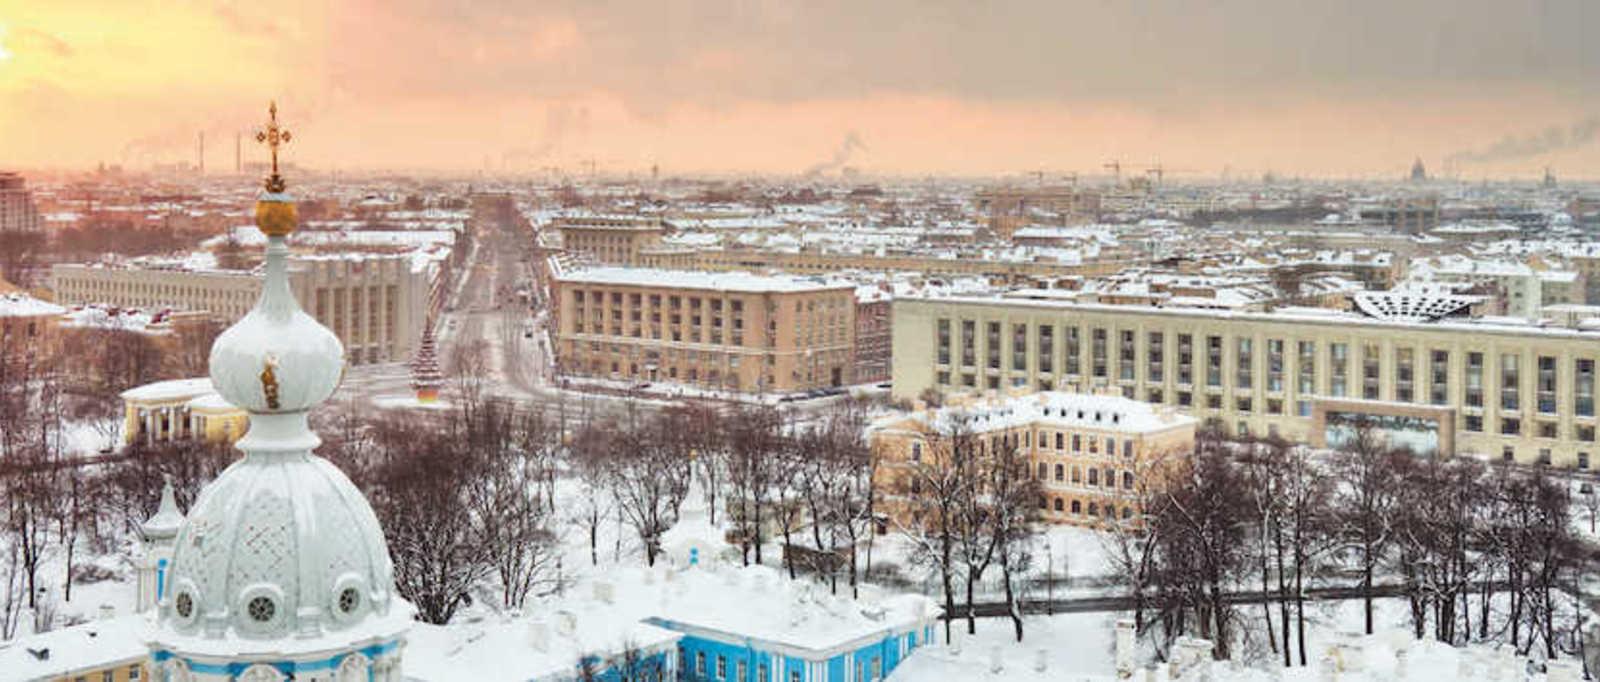 St Petersburg in the snow